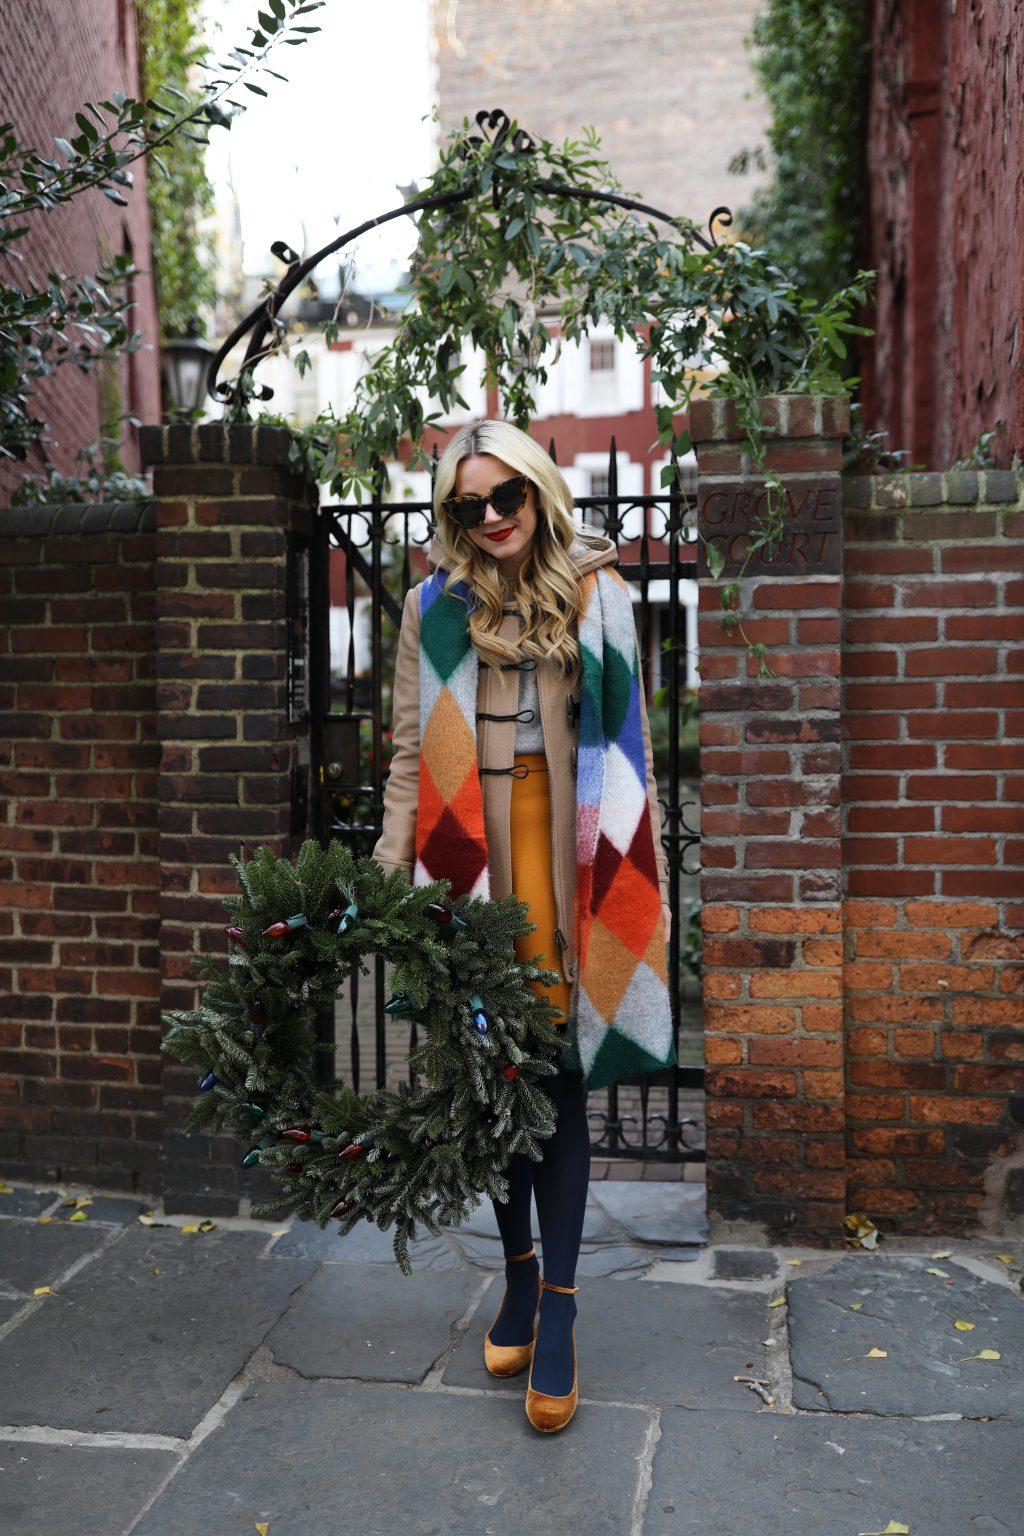 blair-eadie-atlantic-pacific-new-york-city-fashion-blogger-10